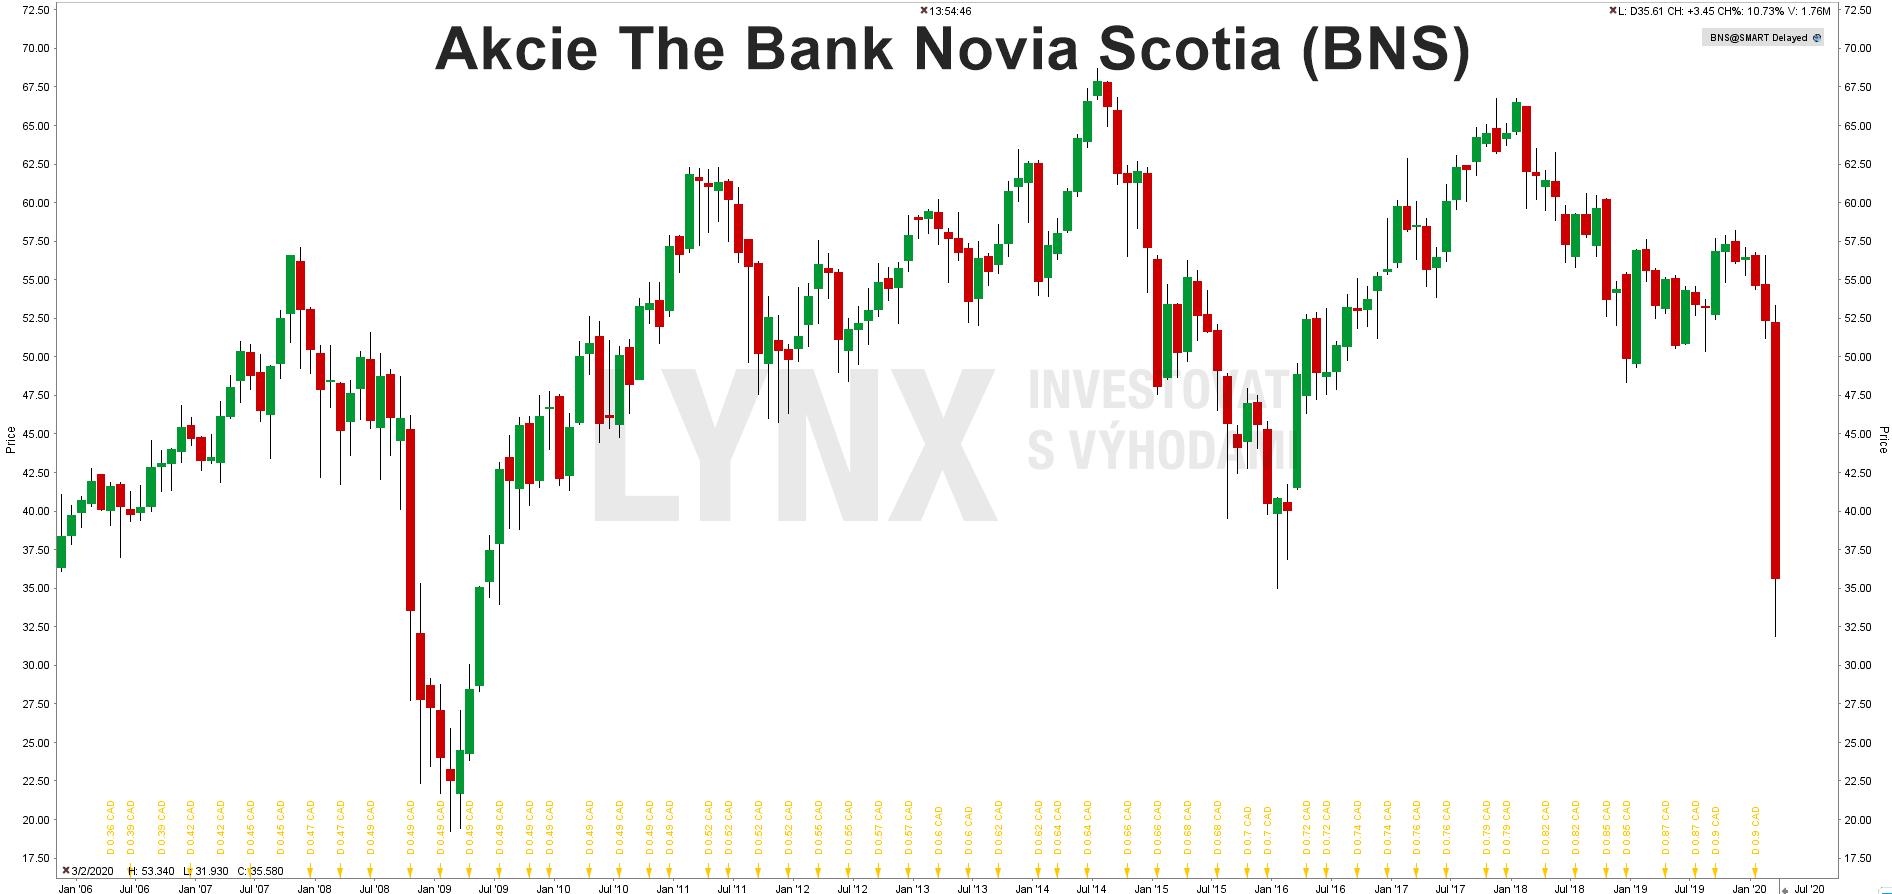 Akcie The Bank Novia Scotia (BNS)